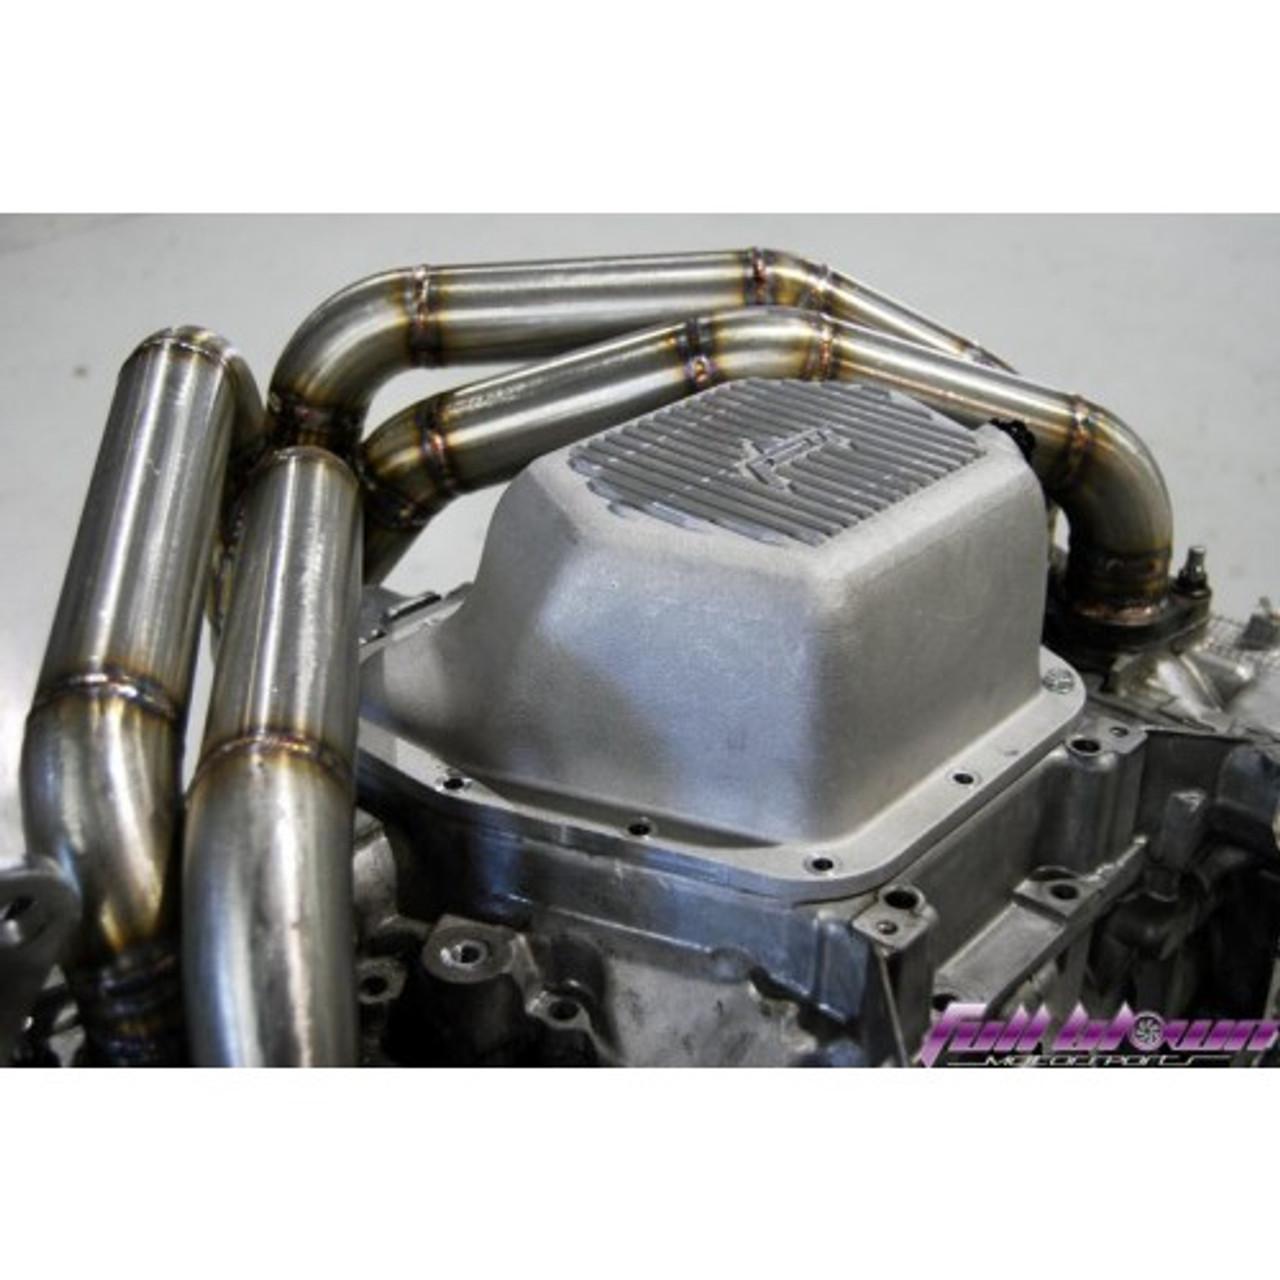 Full Blown FRS BRZ Cast Aluminum Oil pan